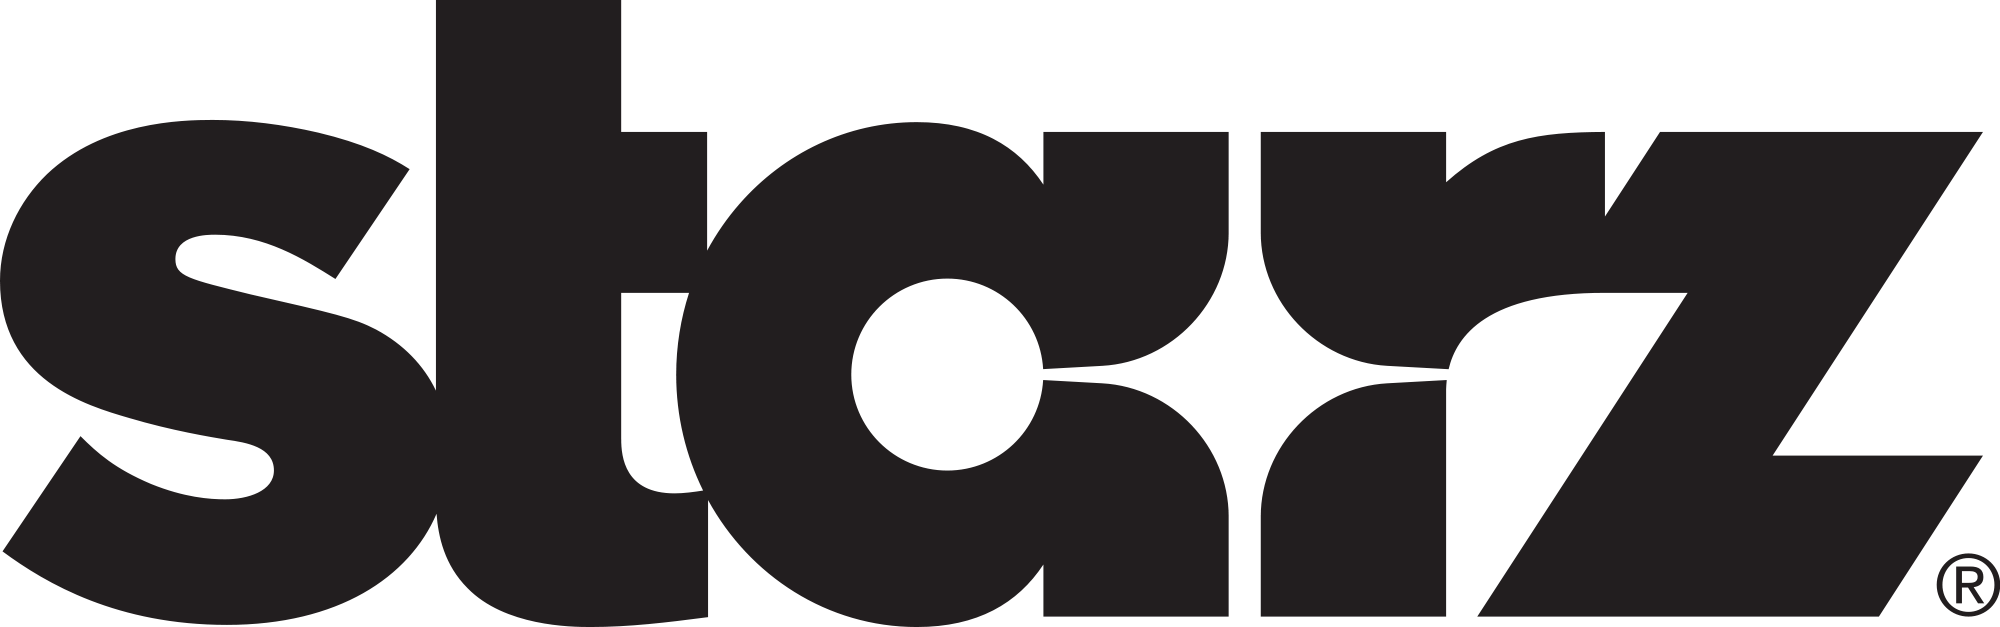 Starz_Logo_01